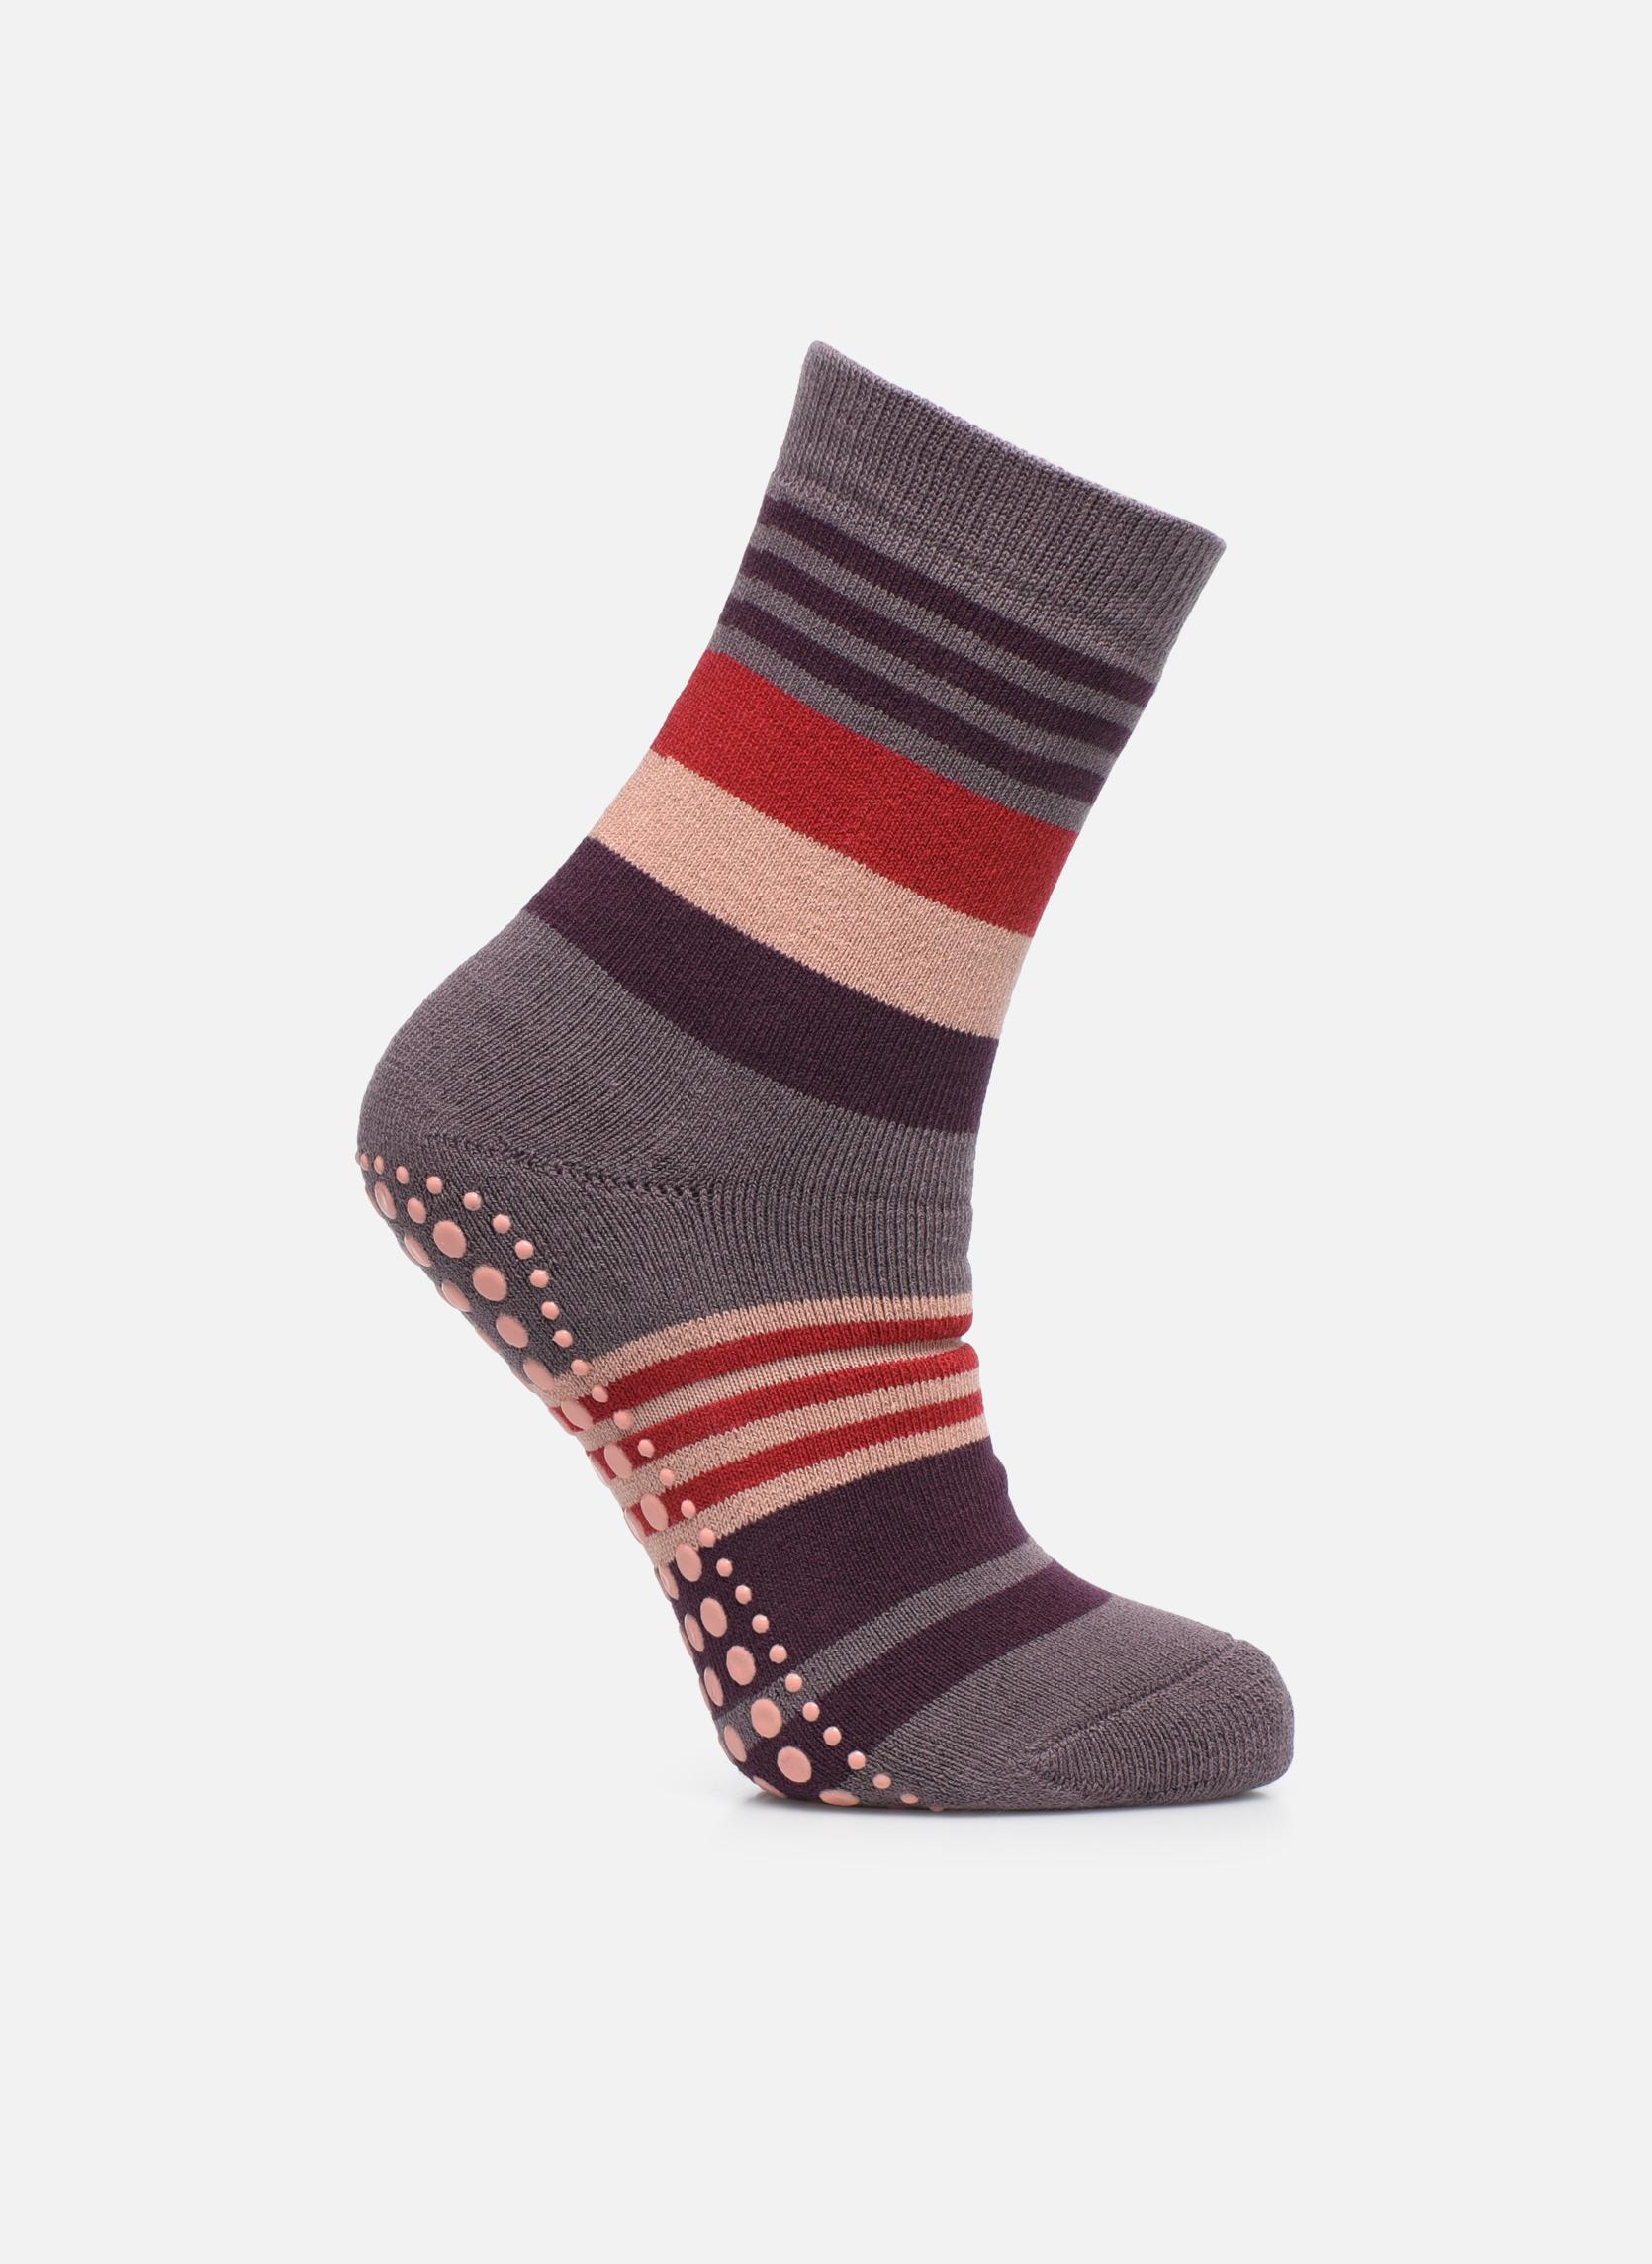 Chaussons-chaussettes Irregular Stripe Catspads 8203